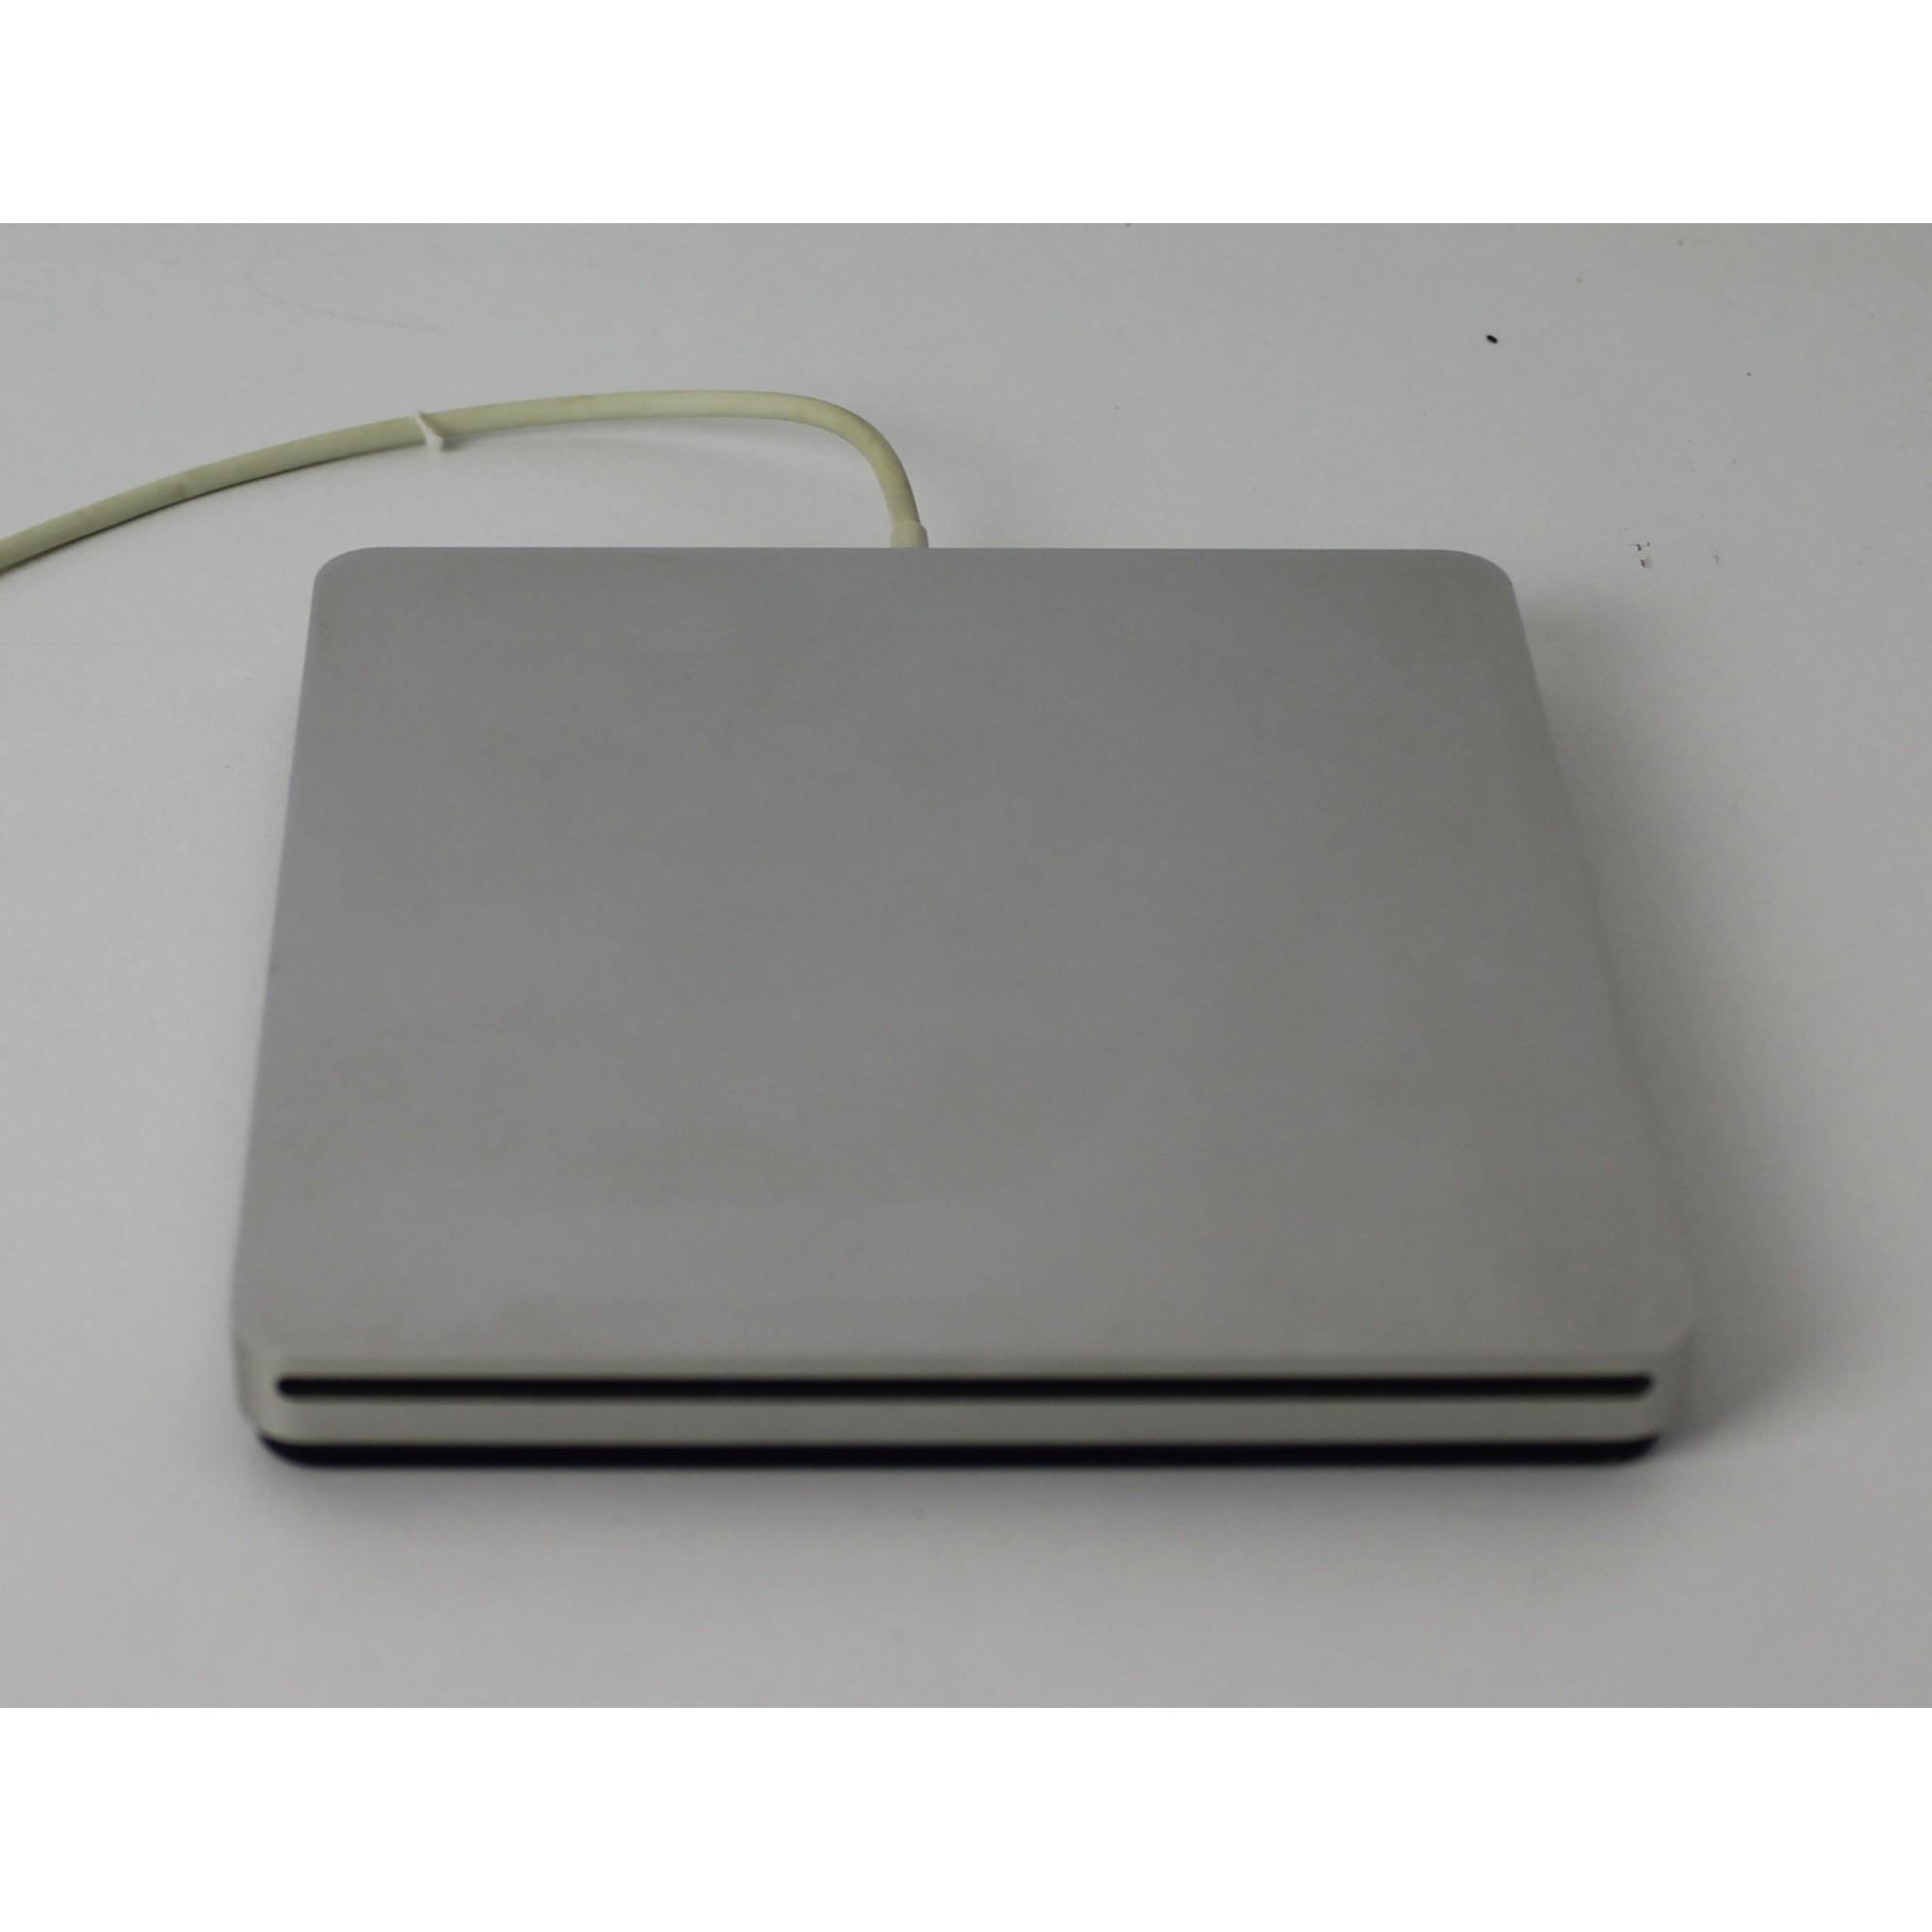 SUPERDRIVE USB APPLE - A1379